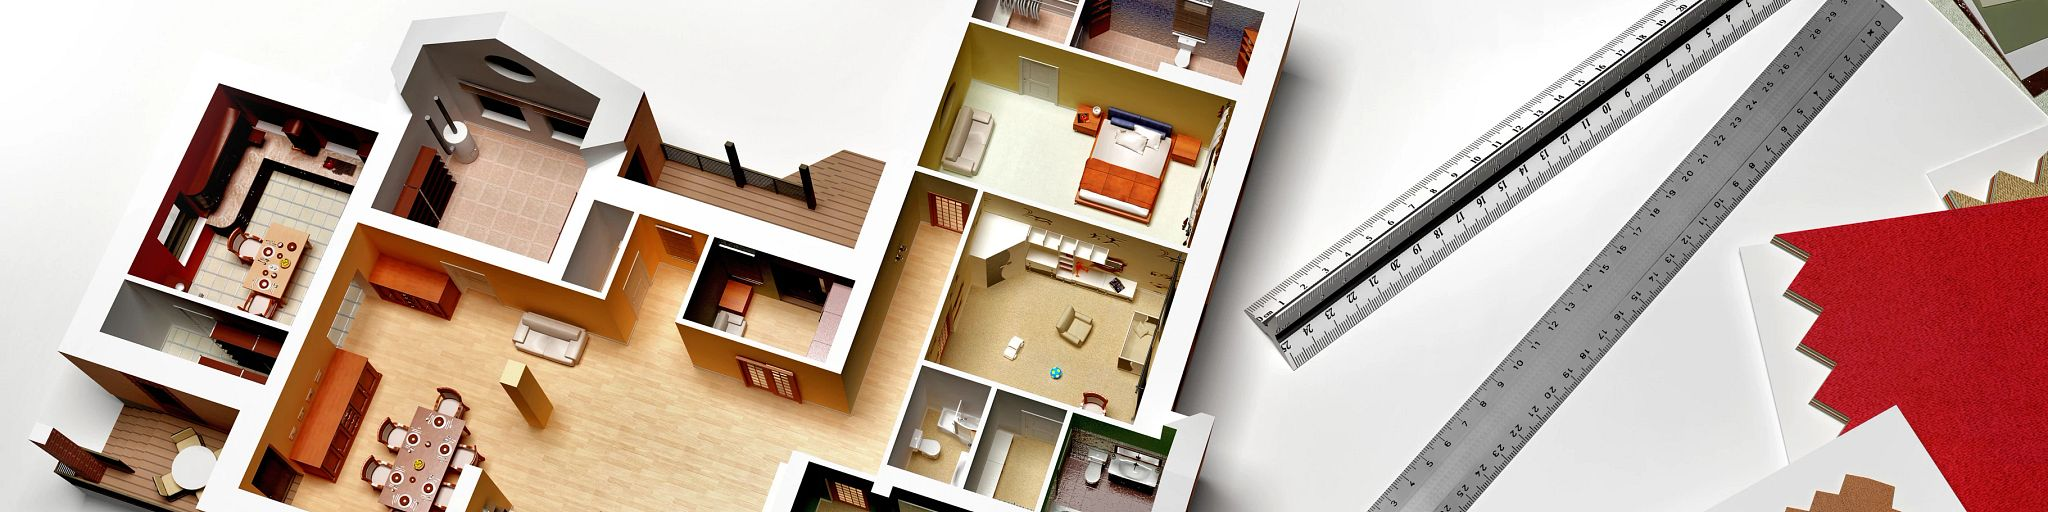 interior design color housing